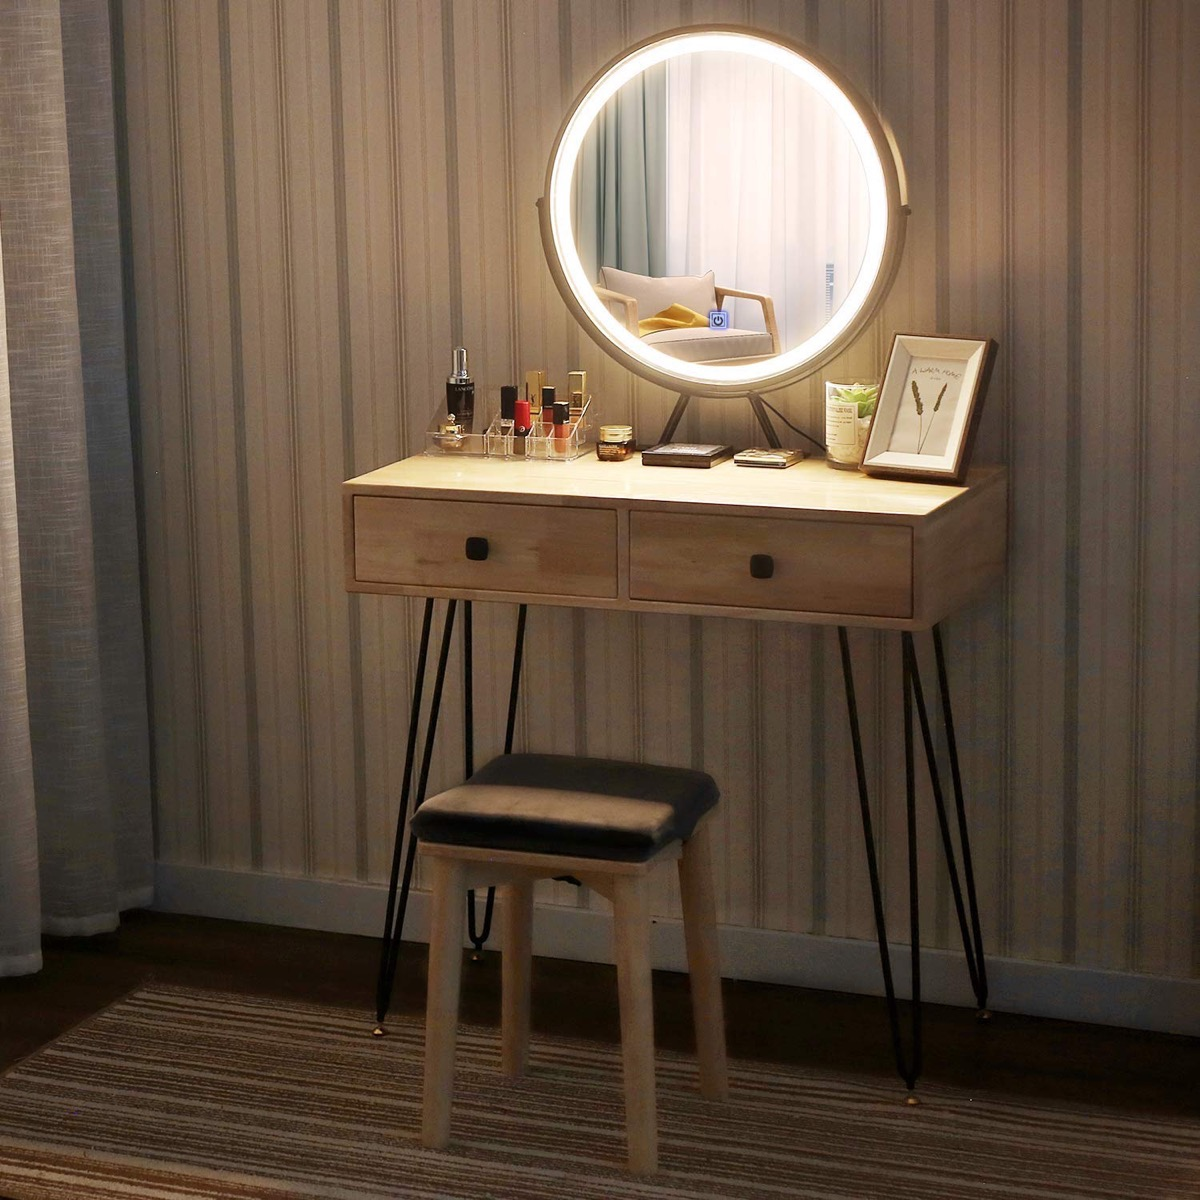 touchscreen mirror on wooden desk